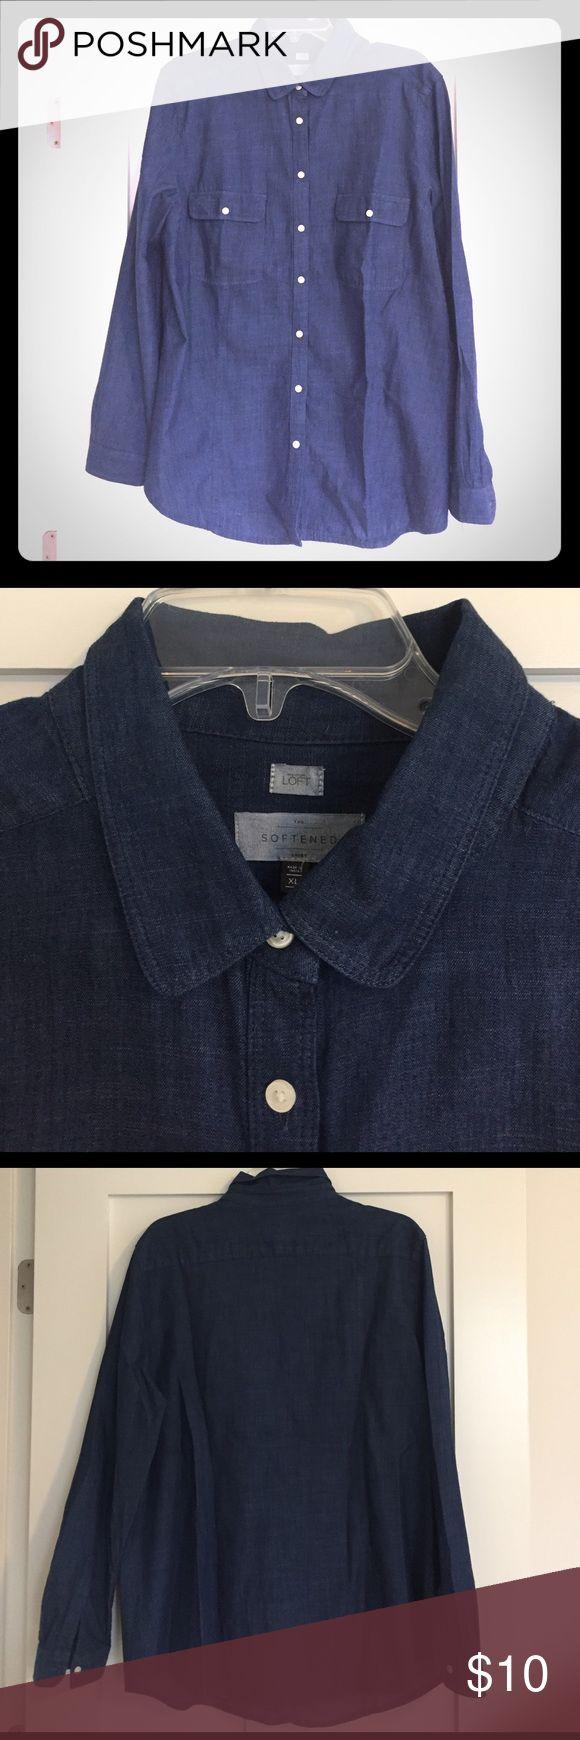 LOFT Softened Denim Button Down Shirt Long-sleeved LOFT button down shirt in softened denim (seriously, so soft!). Two front pockets. LOFT Tops Button Down Shirts